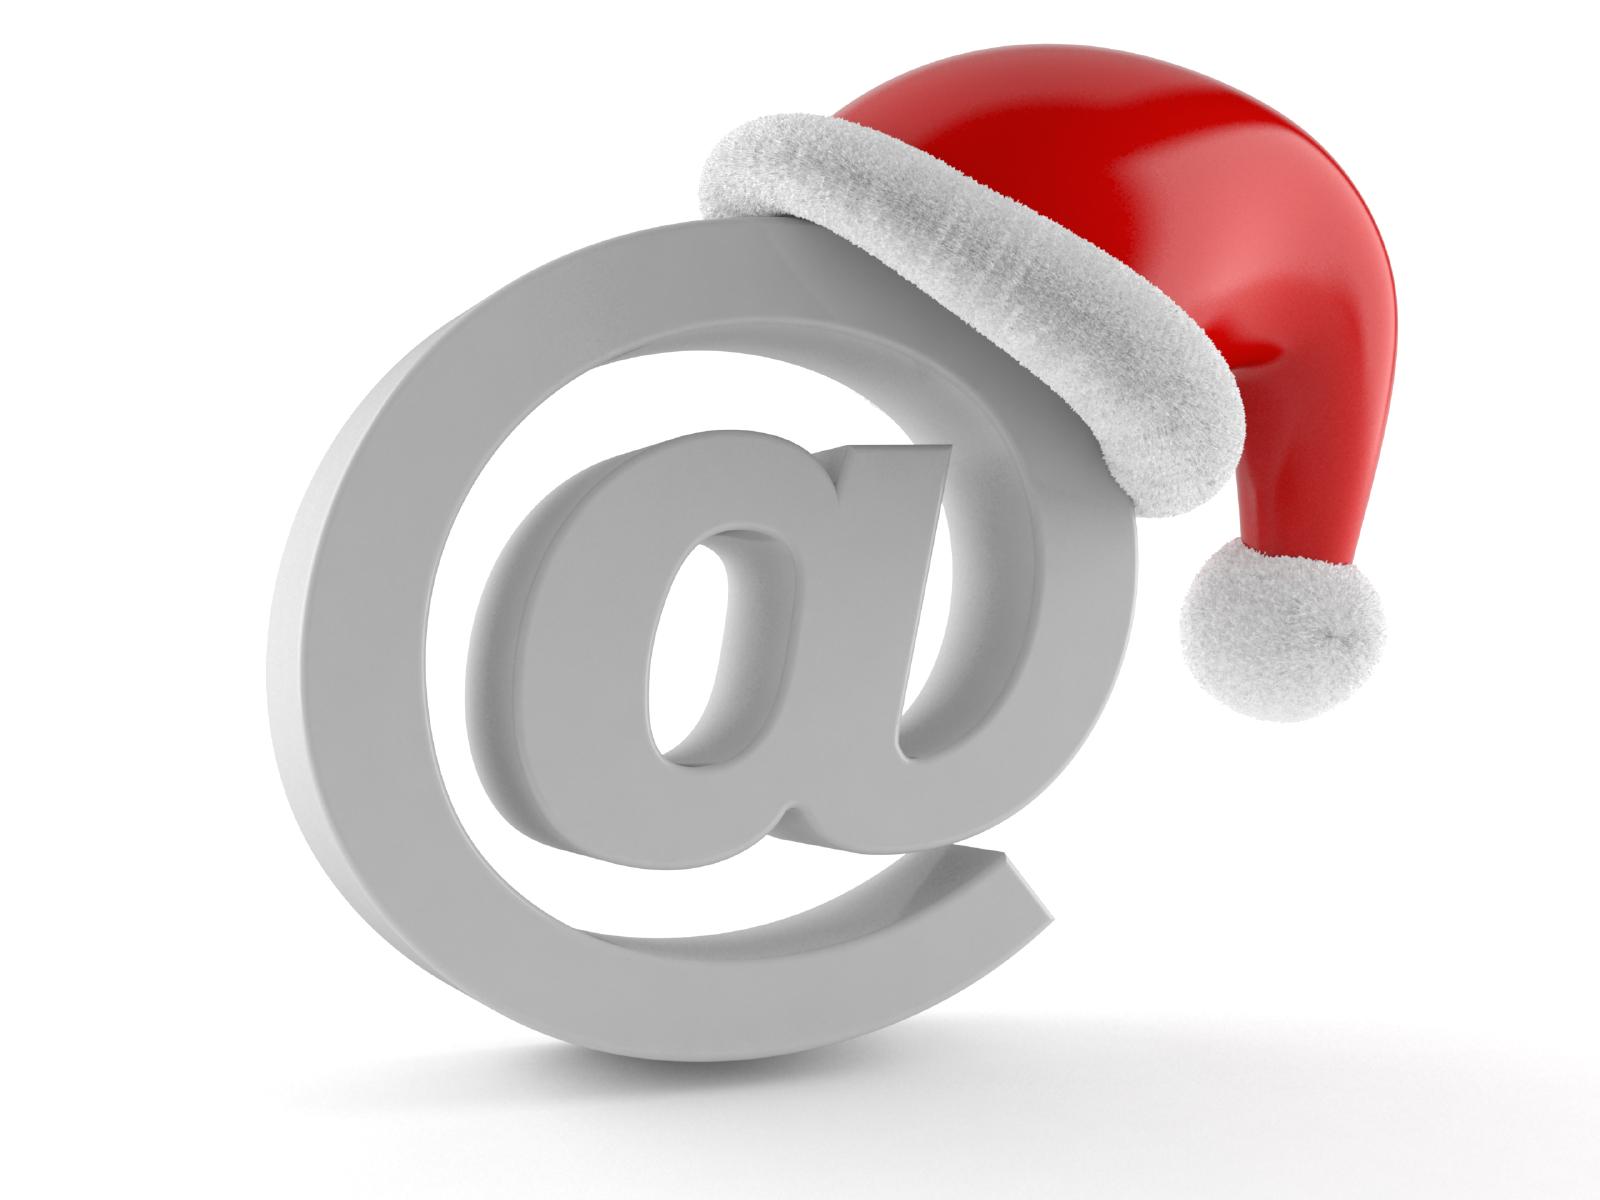 karácsony_emailmarketing.jpg